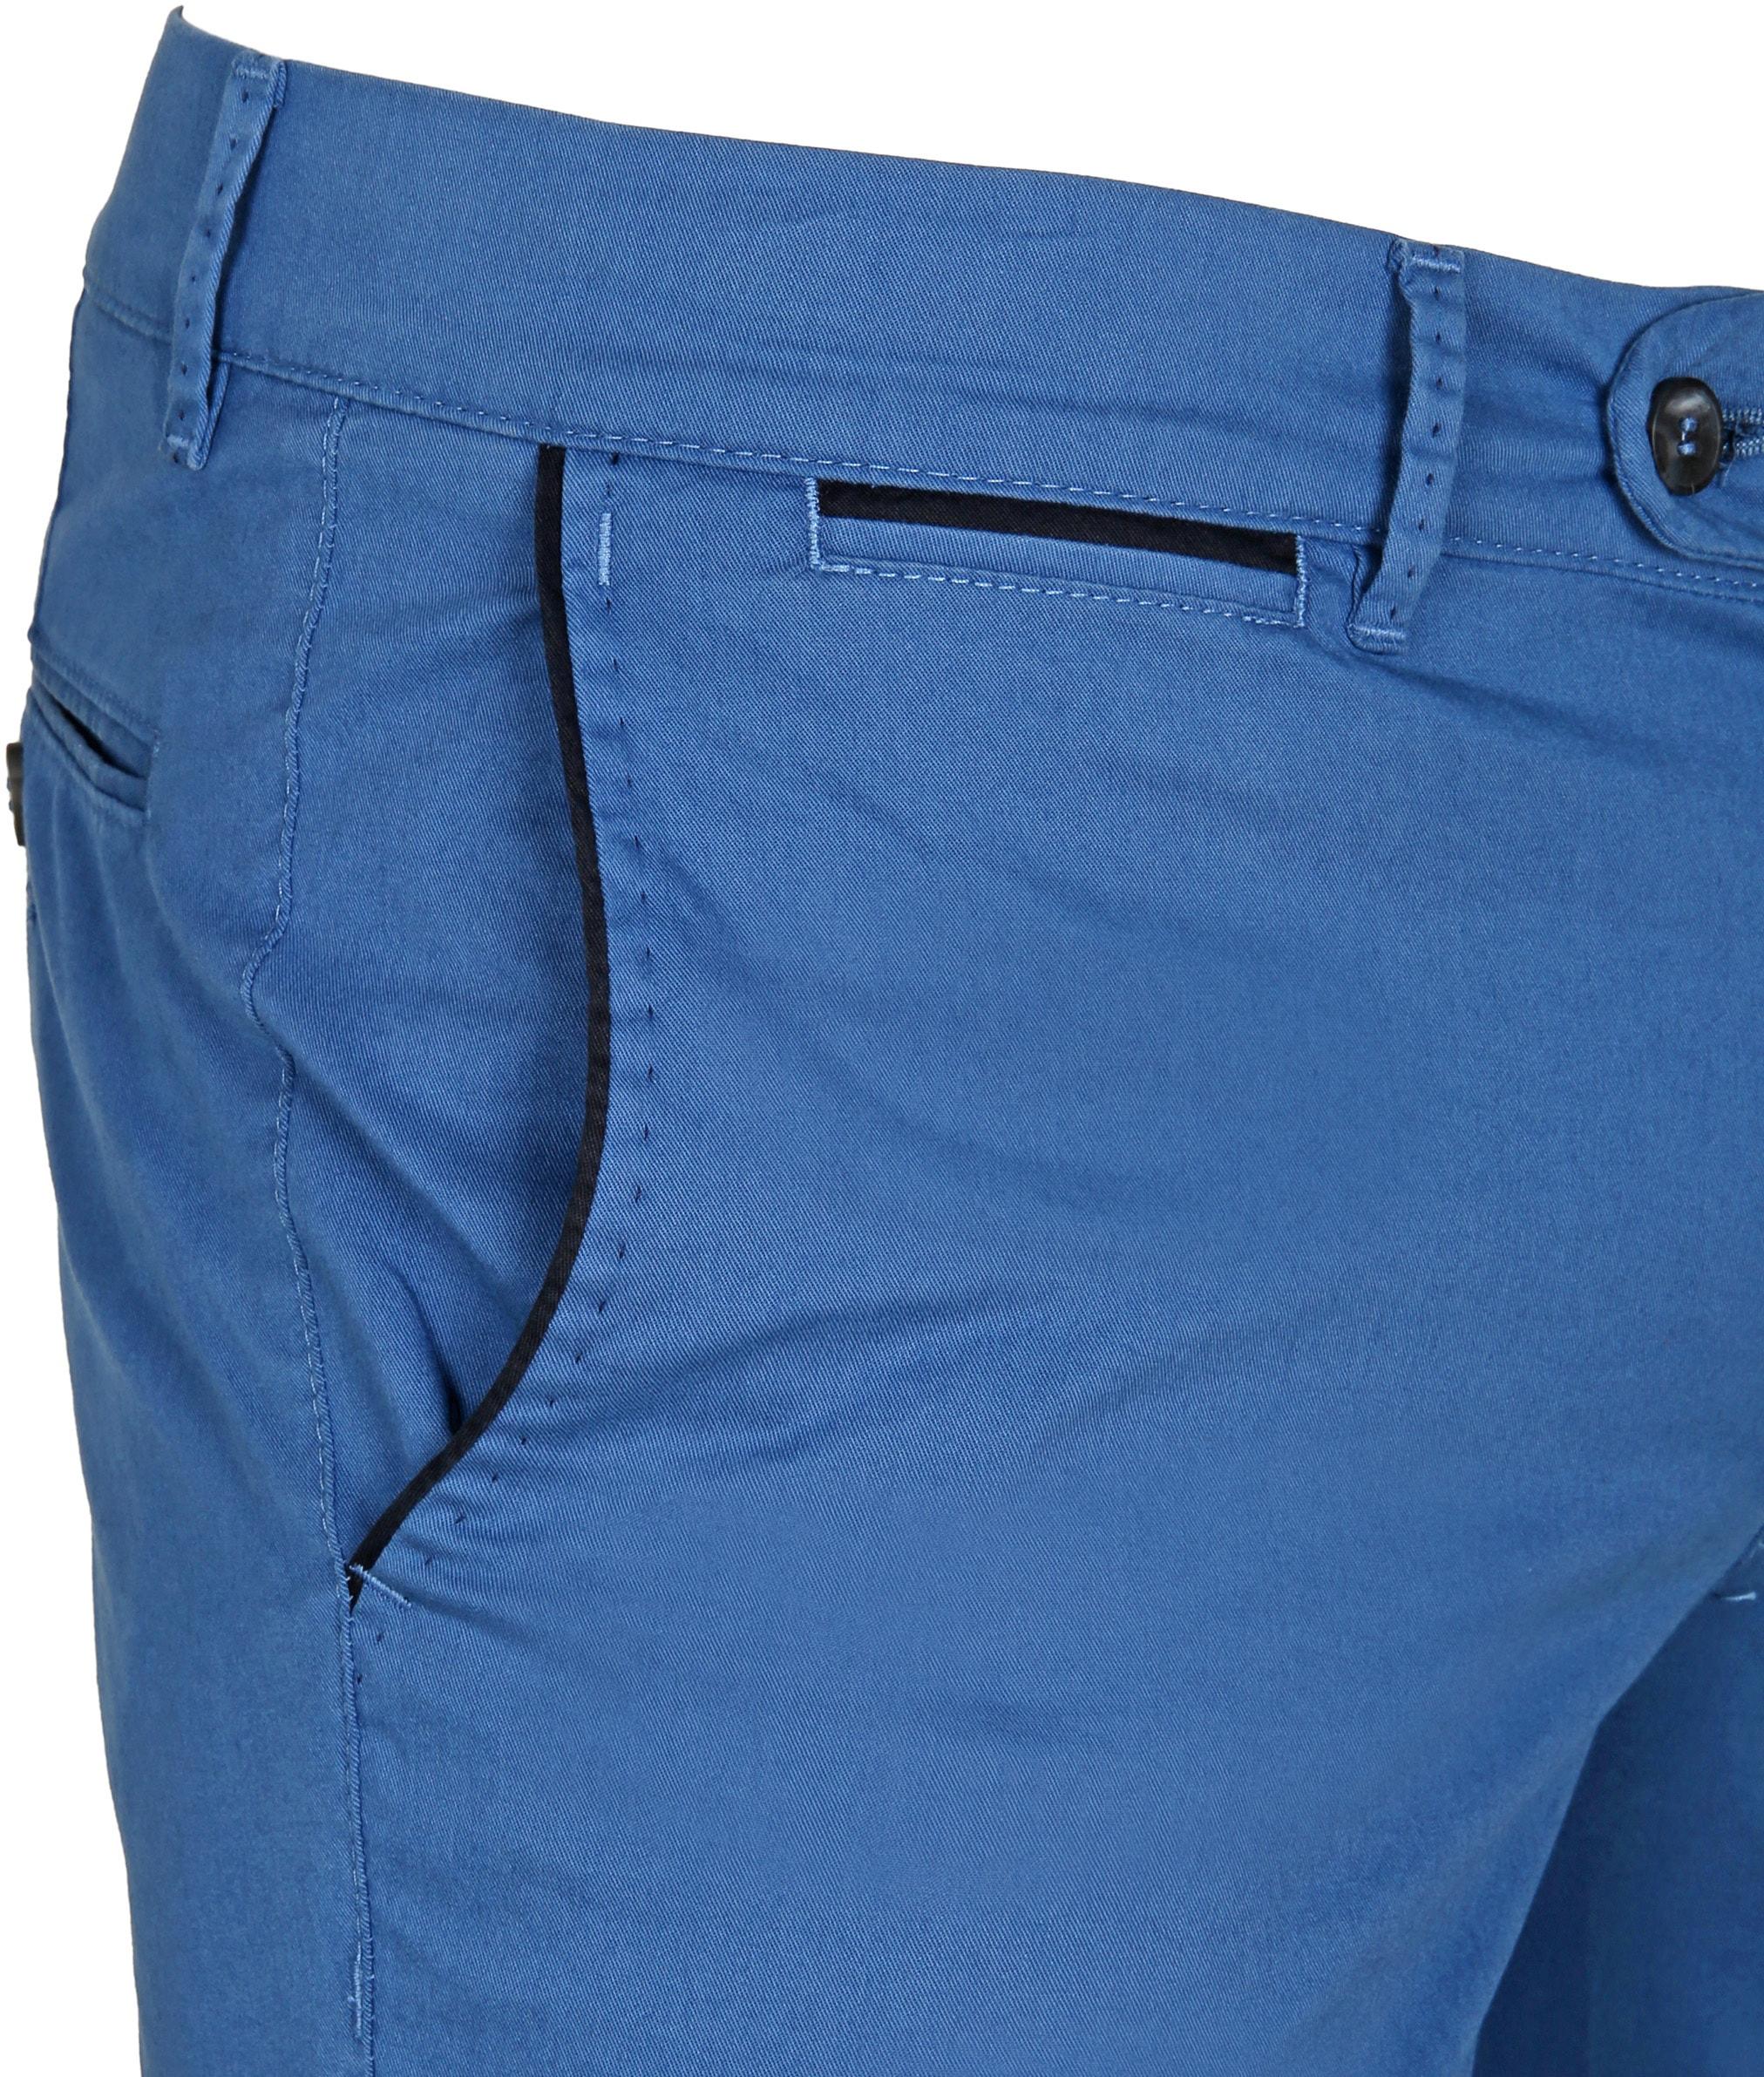 Suitable Chino Short Blauw foto 1